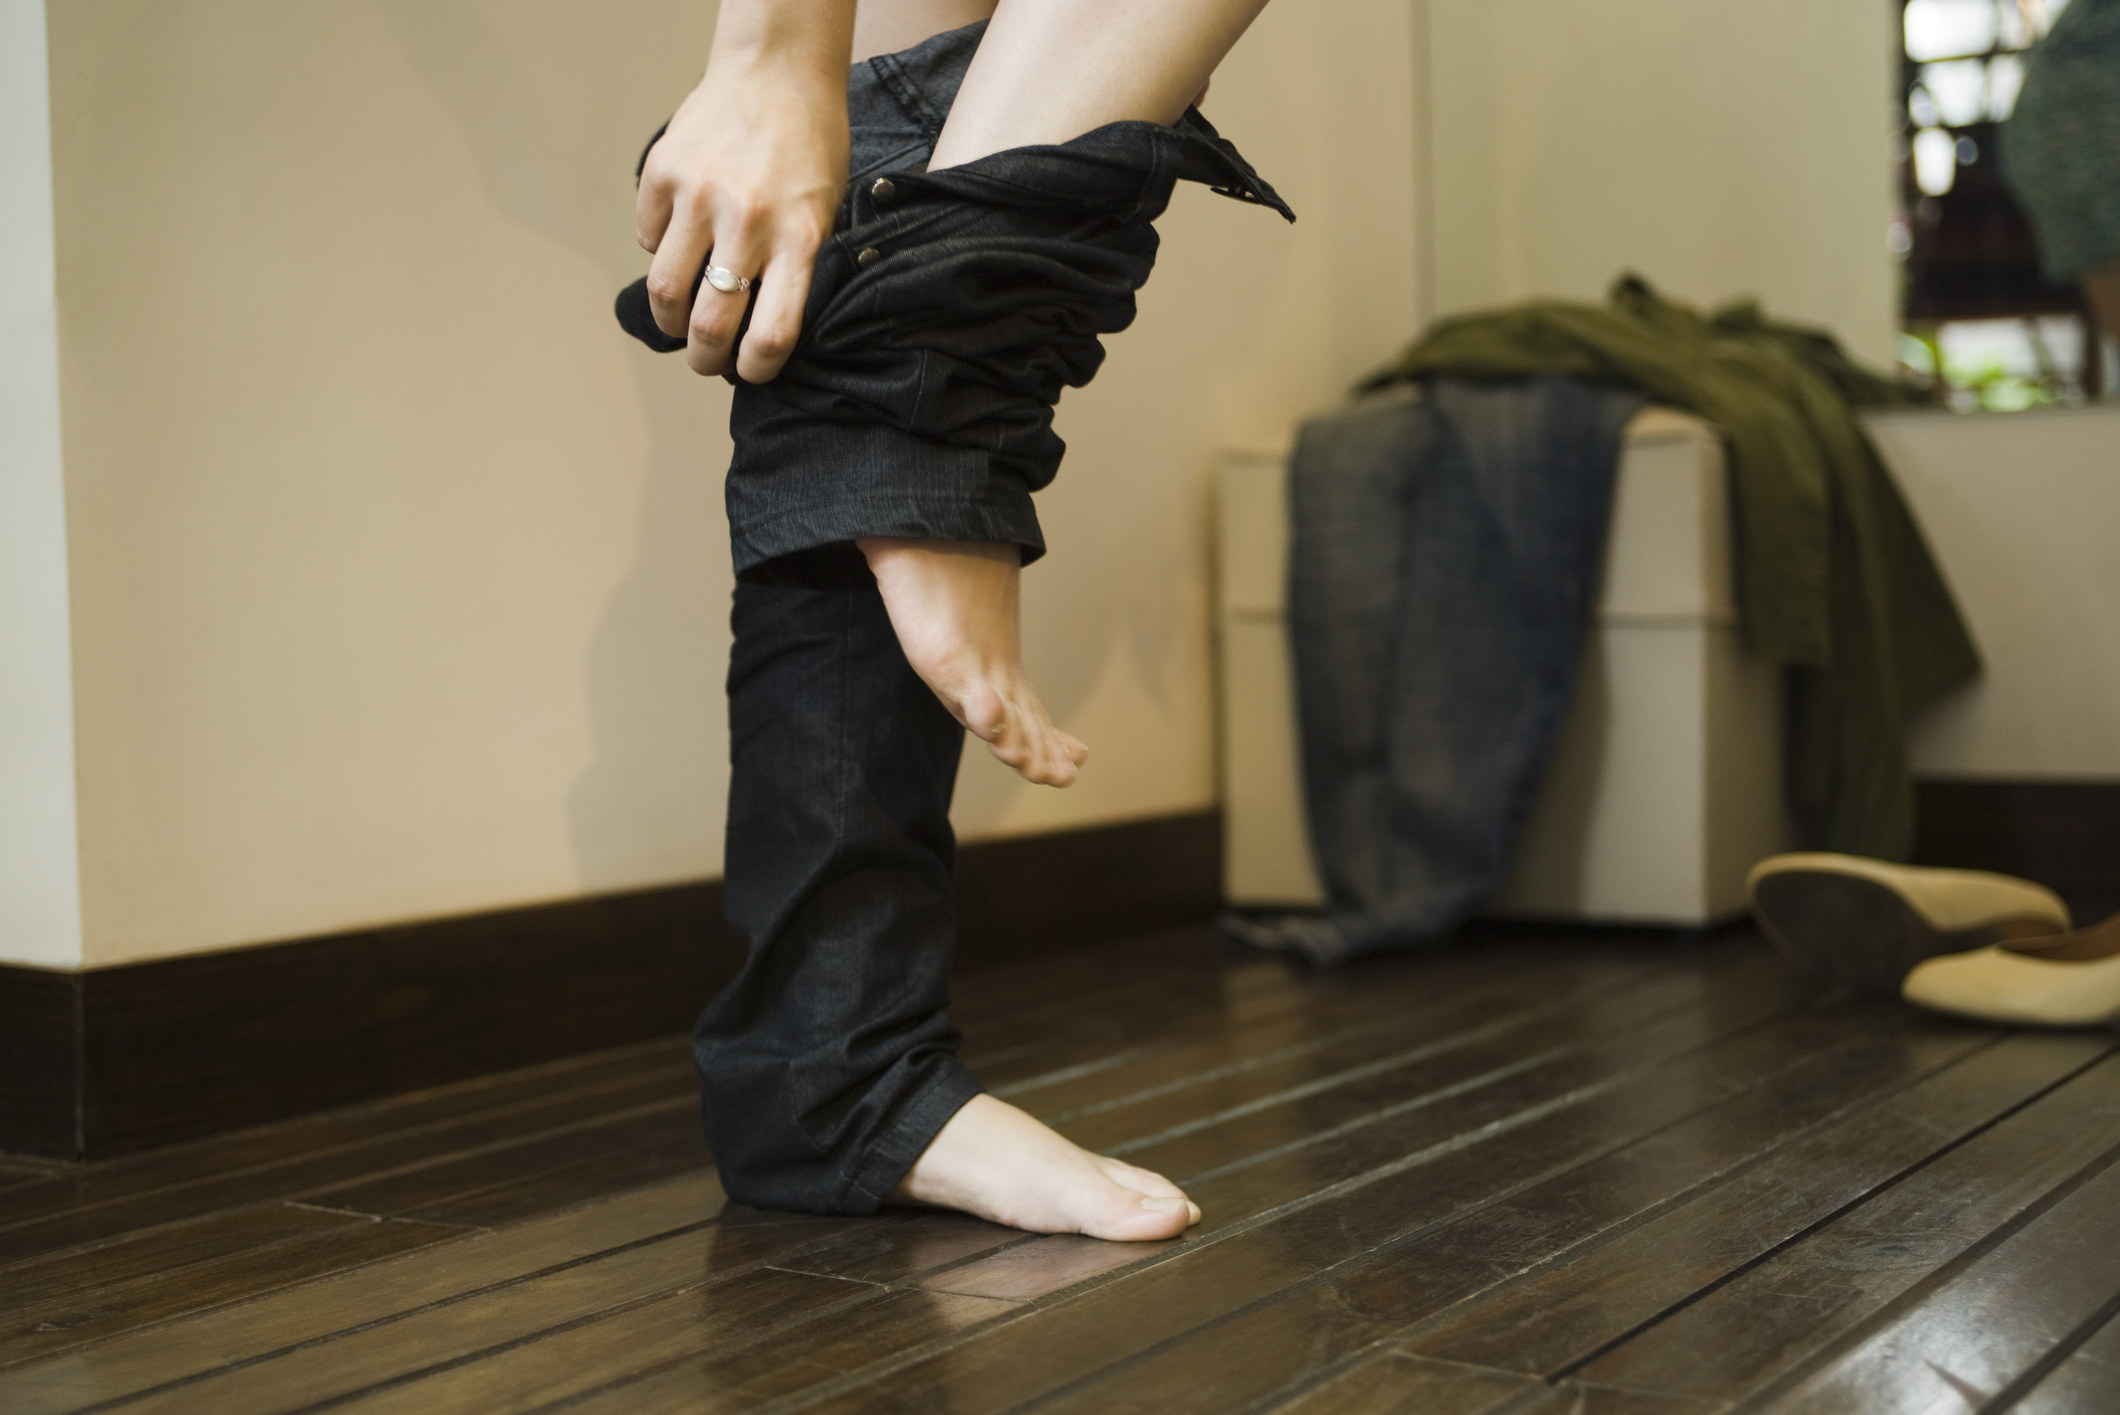 a woman removing pants